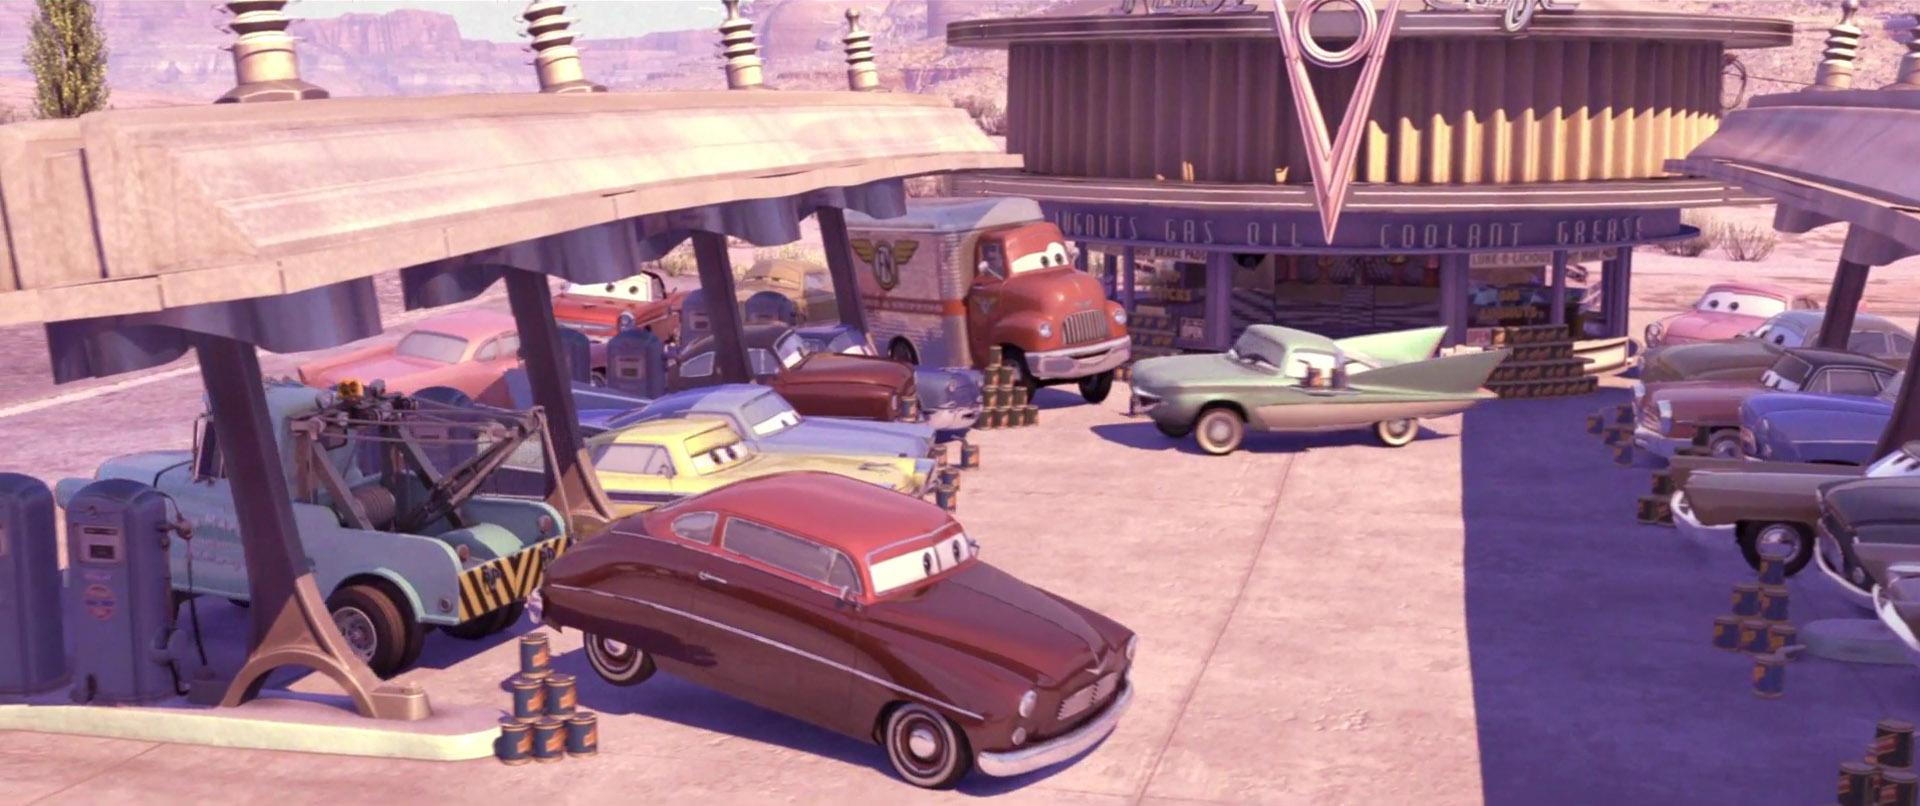 percy hanbrakes personnage character pixar disney cars